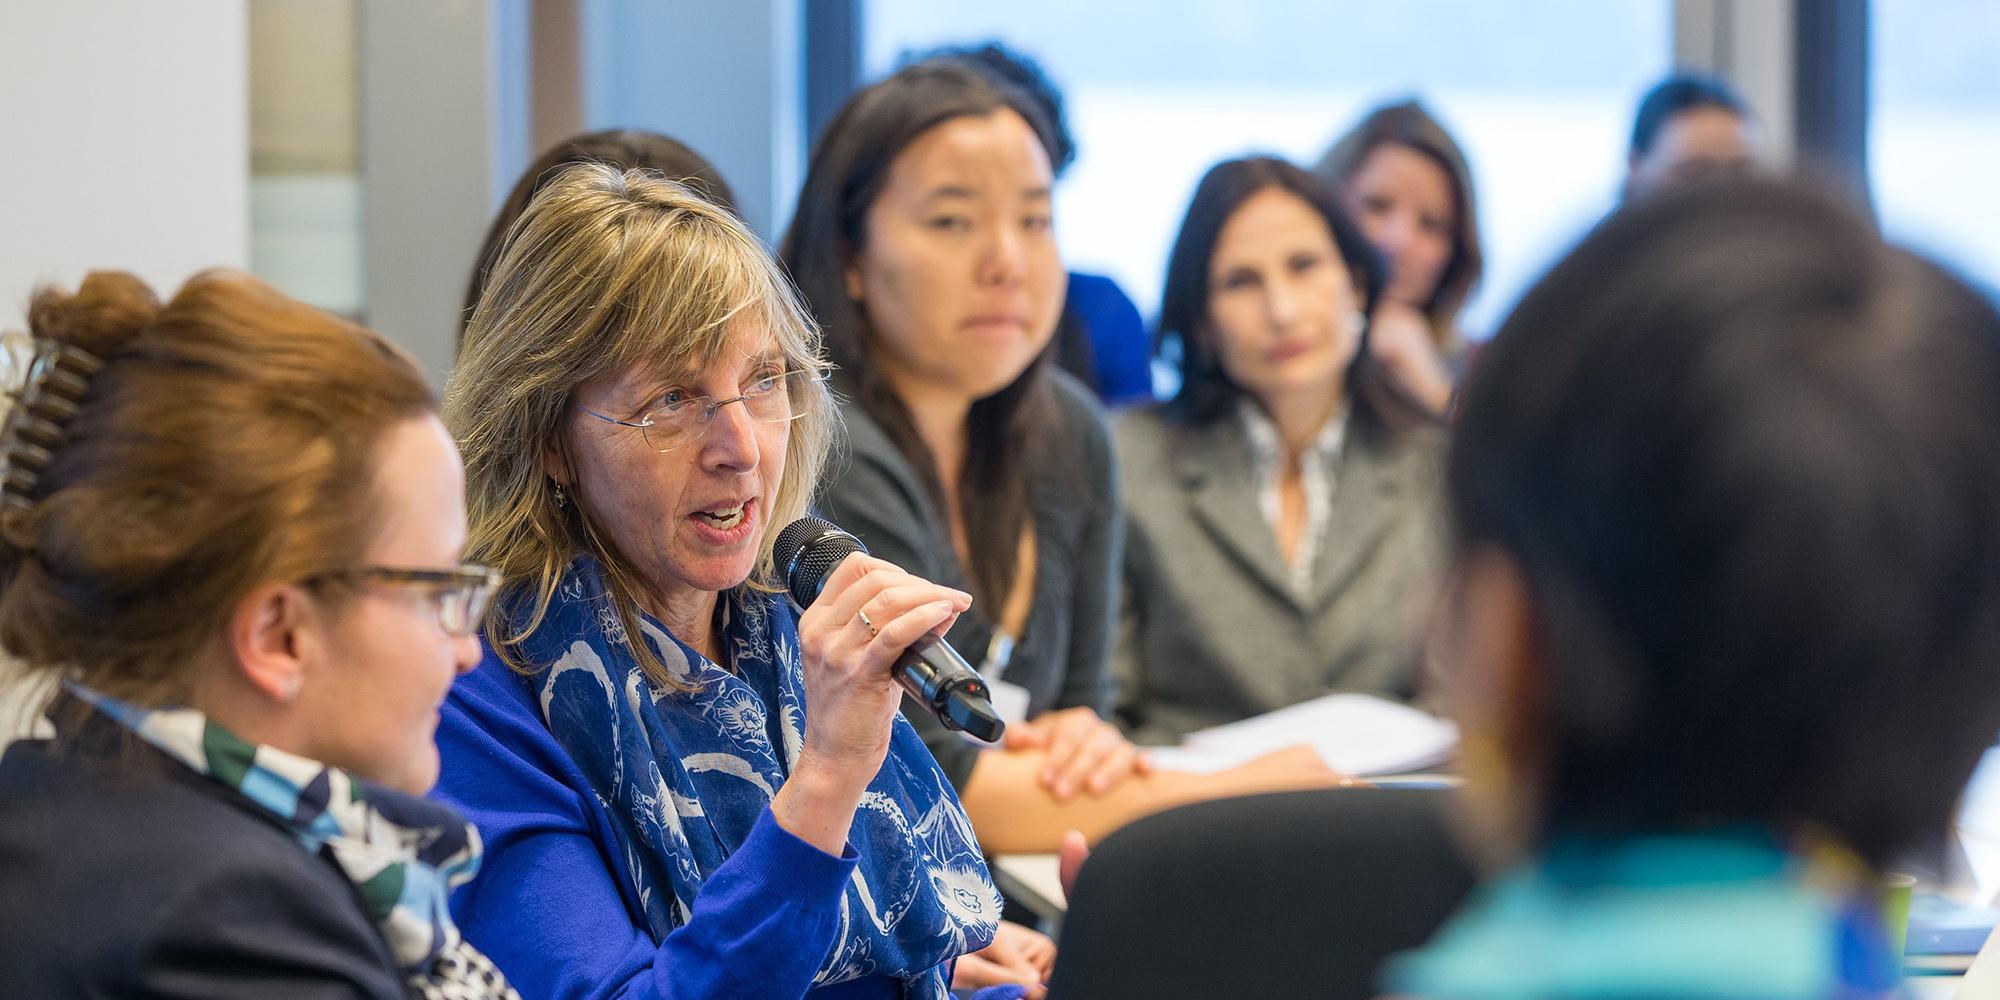 women scientists discuss